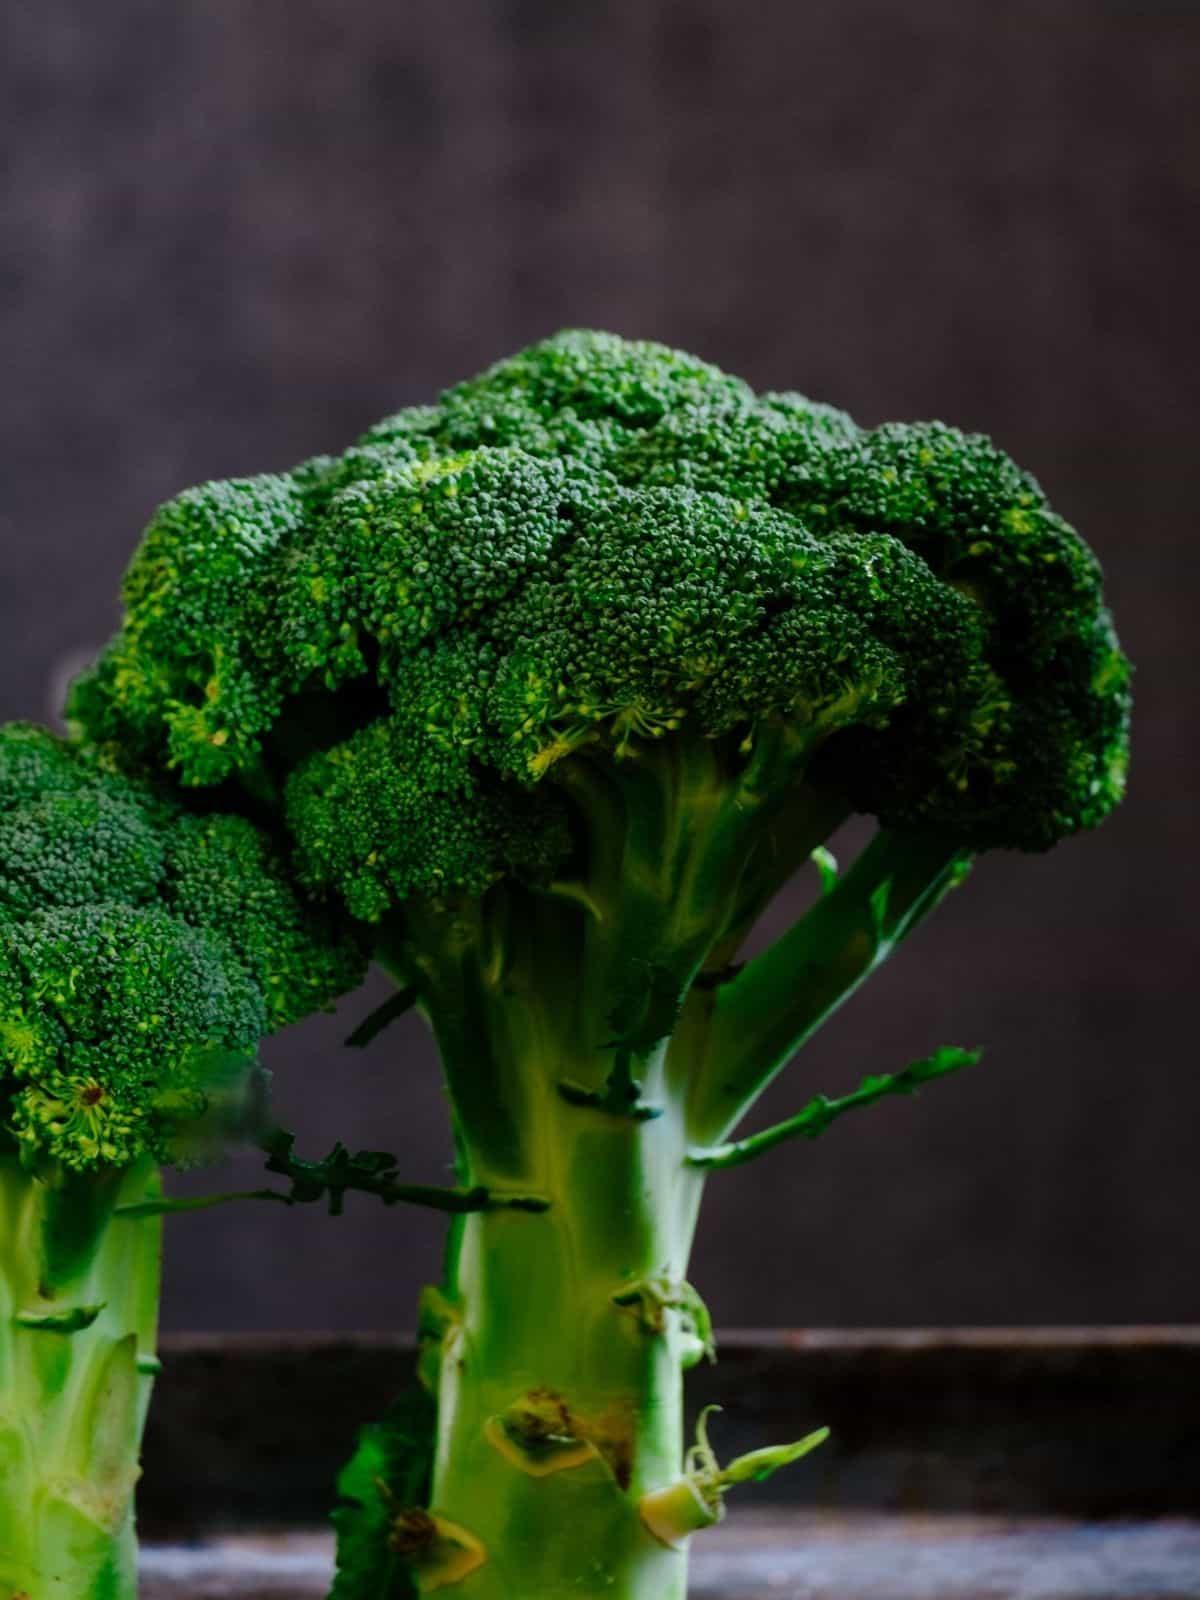 Broccoli wit dark background